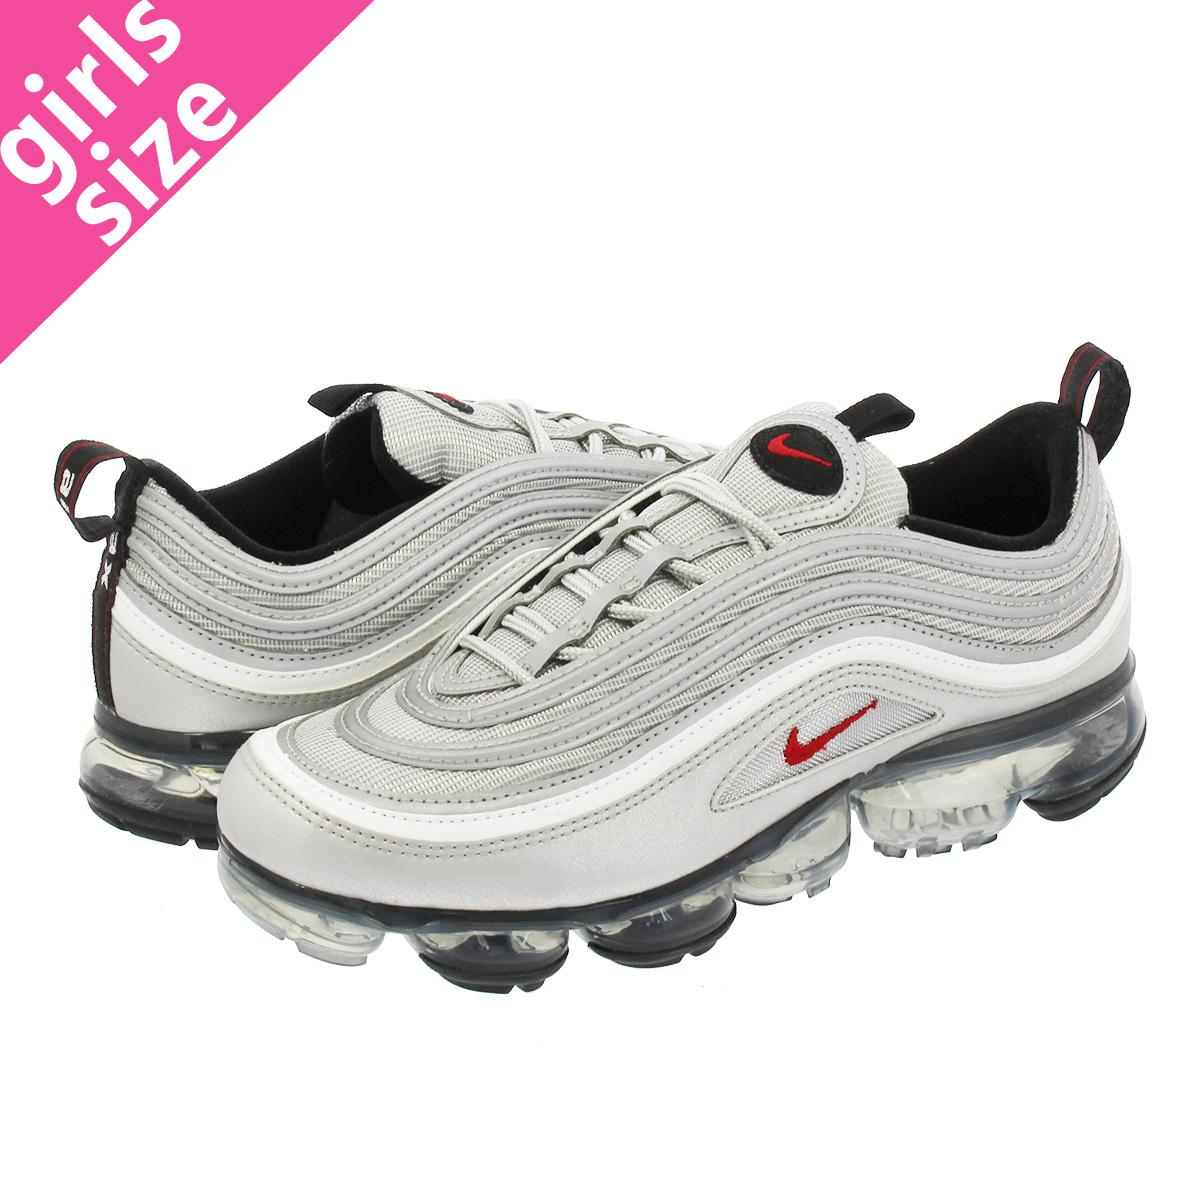 new style 9d93c e56d2 NIKE AIR VAPORMAX 97 Nike air vapor max 97 METALLIC SILVER/VARSITY  RED/WHITE/BLACK aj7291-002-l